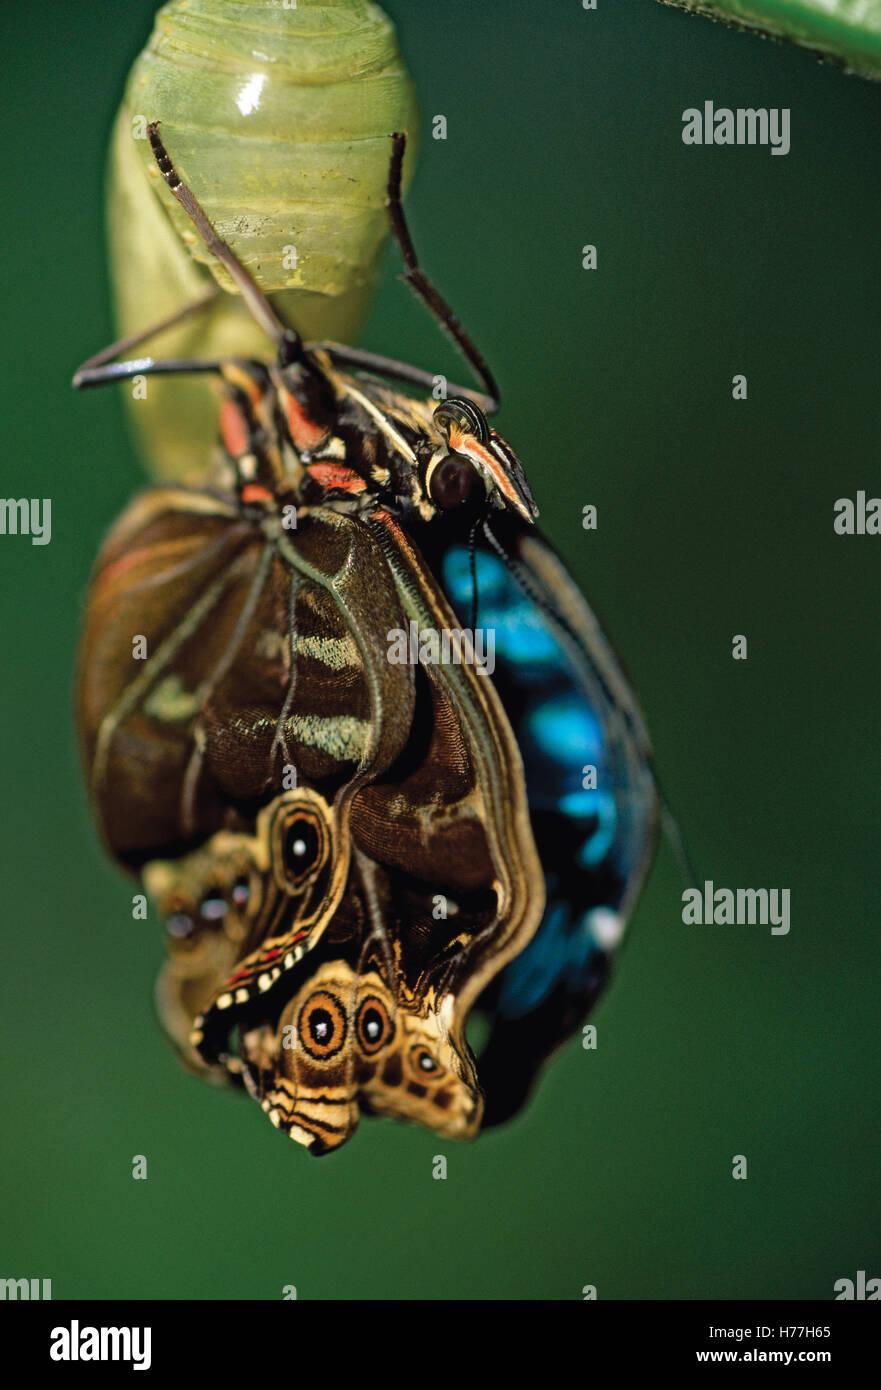 Blue Morpho butterfly (Morpho helenor) emerging from pupa. Costa Rica. - Stock Image